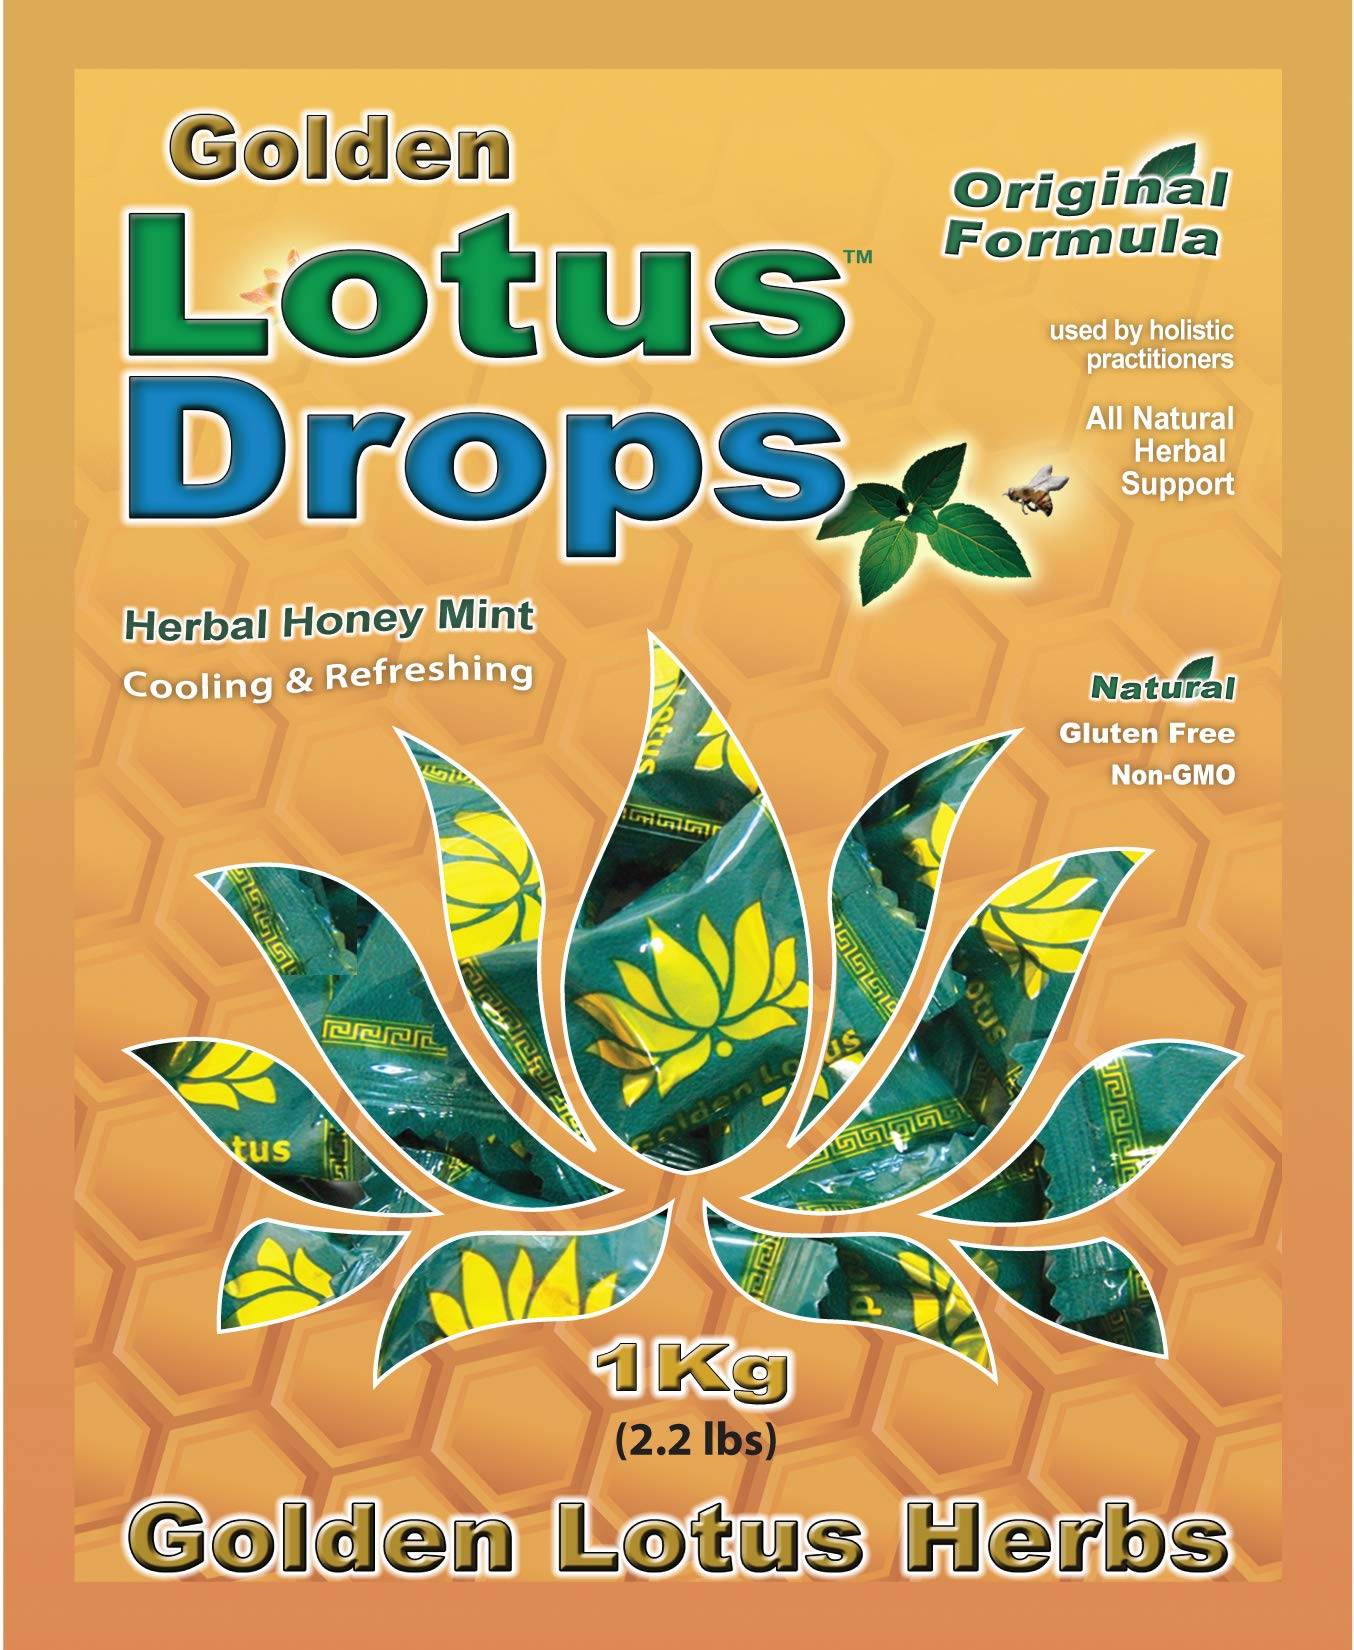 Golden Lotus Drops (Original Formula) - Non GMO (1 Kilo) by Golden Lotus Herbs